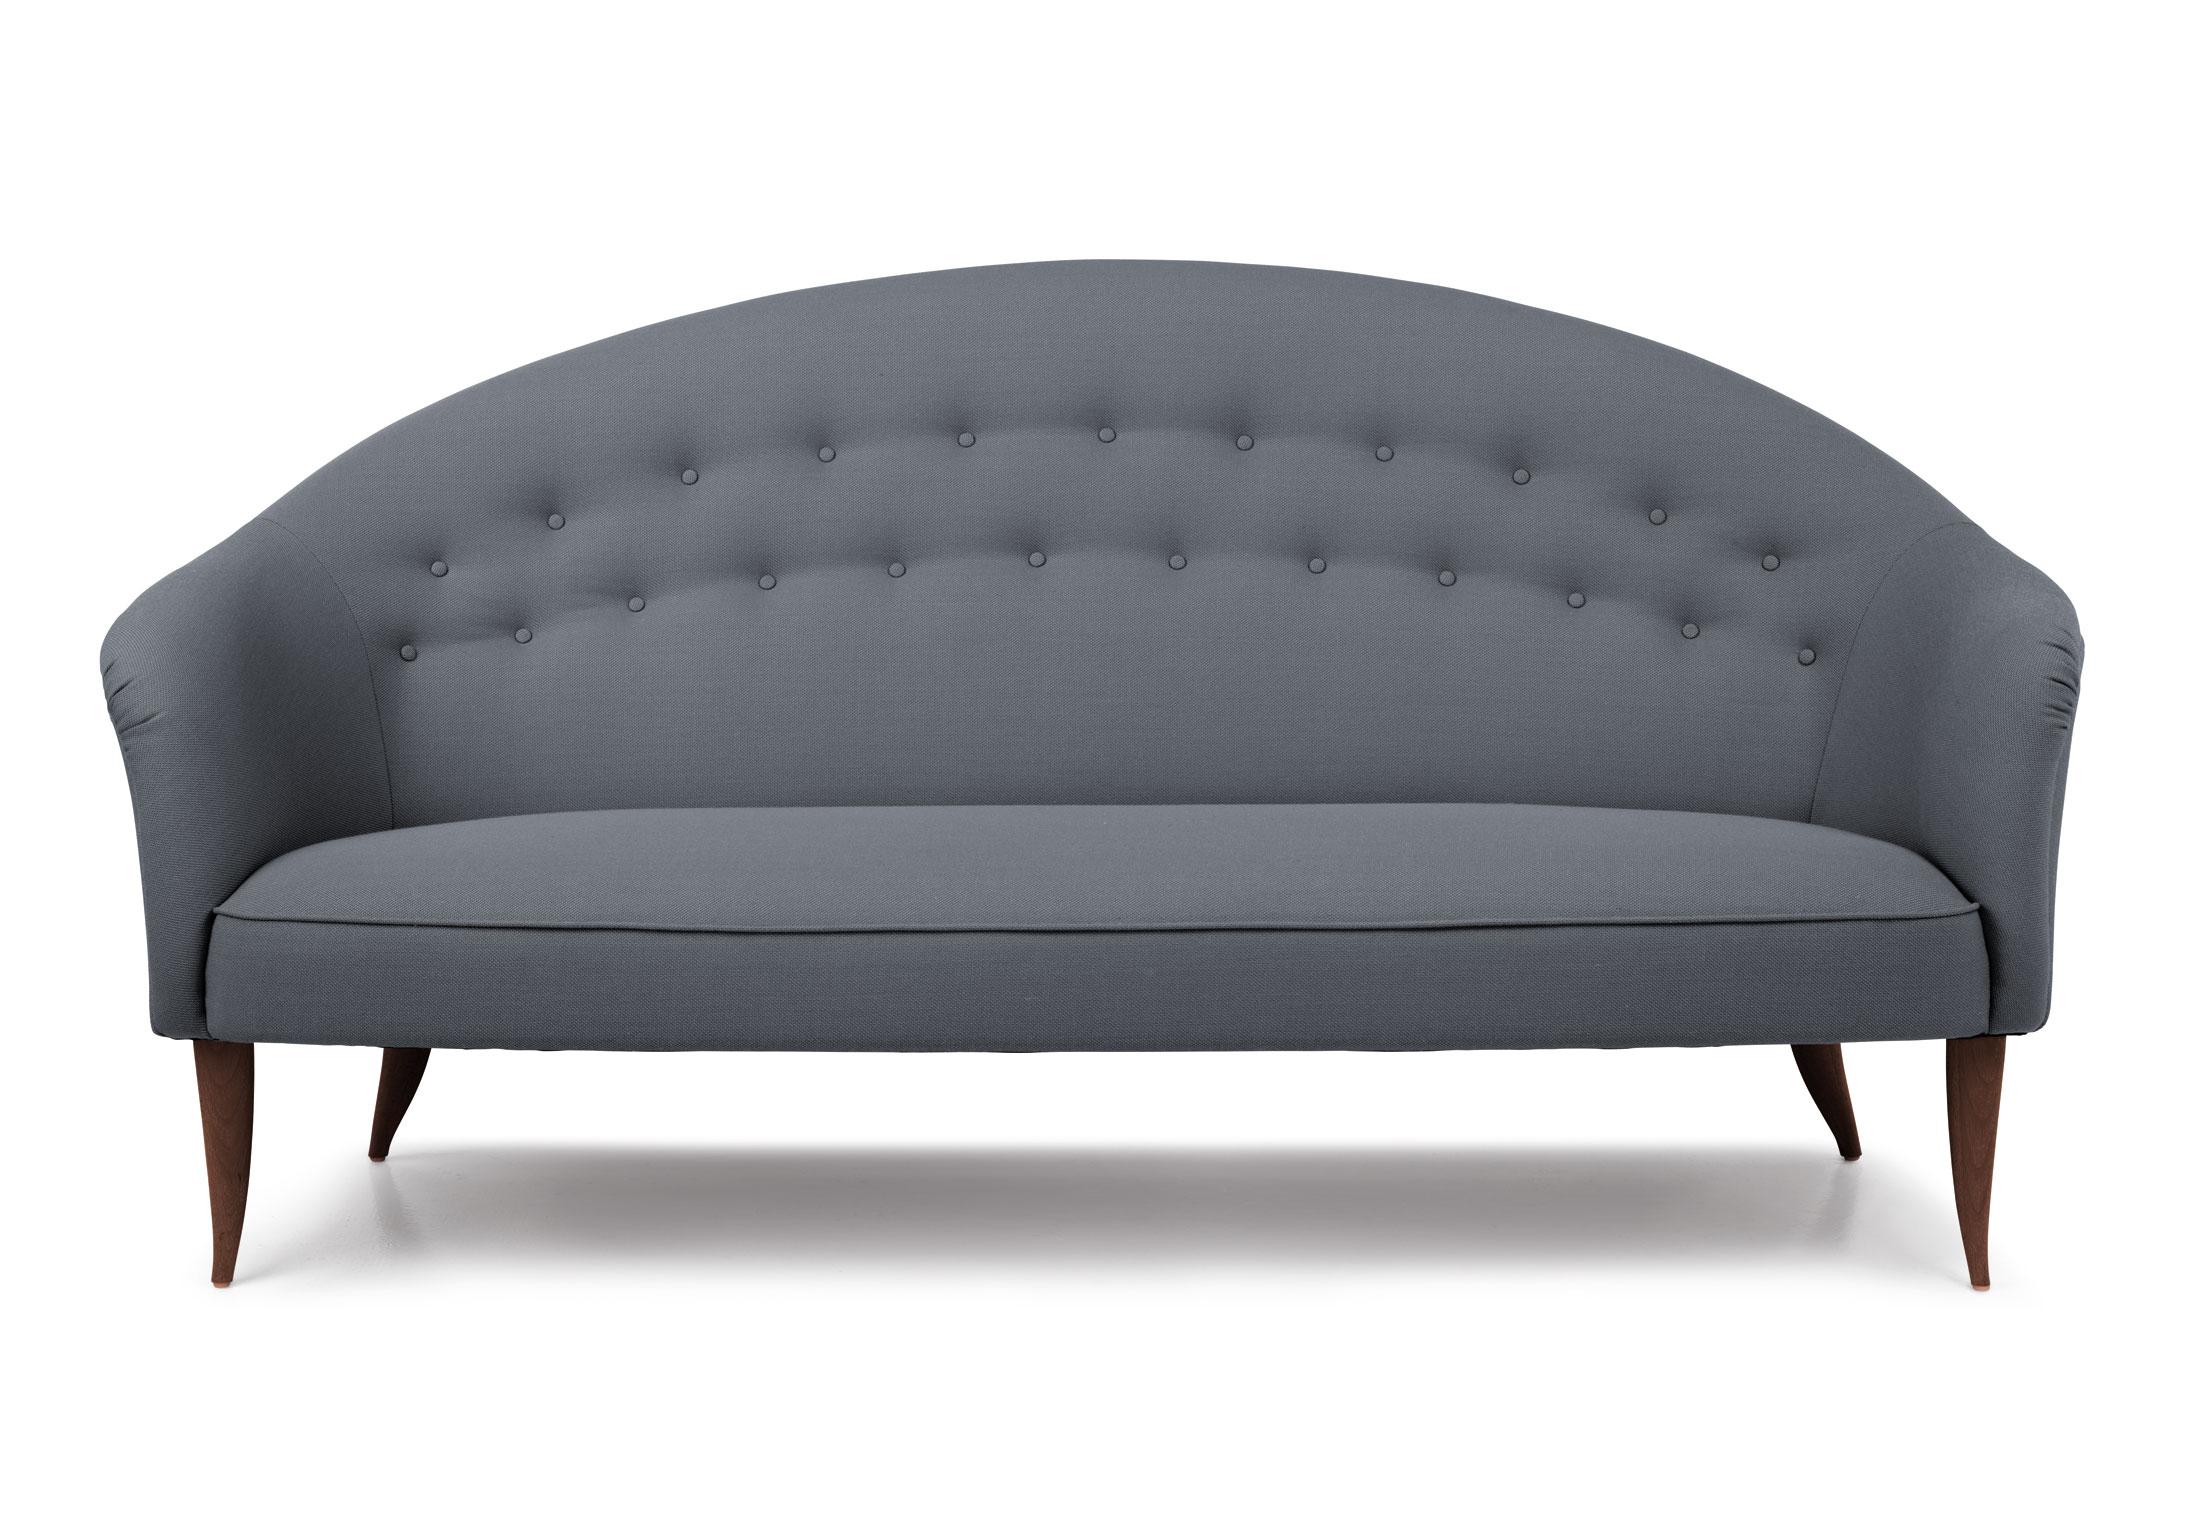 Paradiset Sofa By Gubi Stylepark